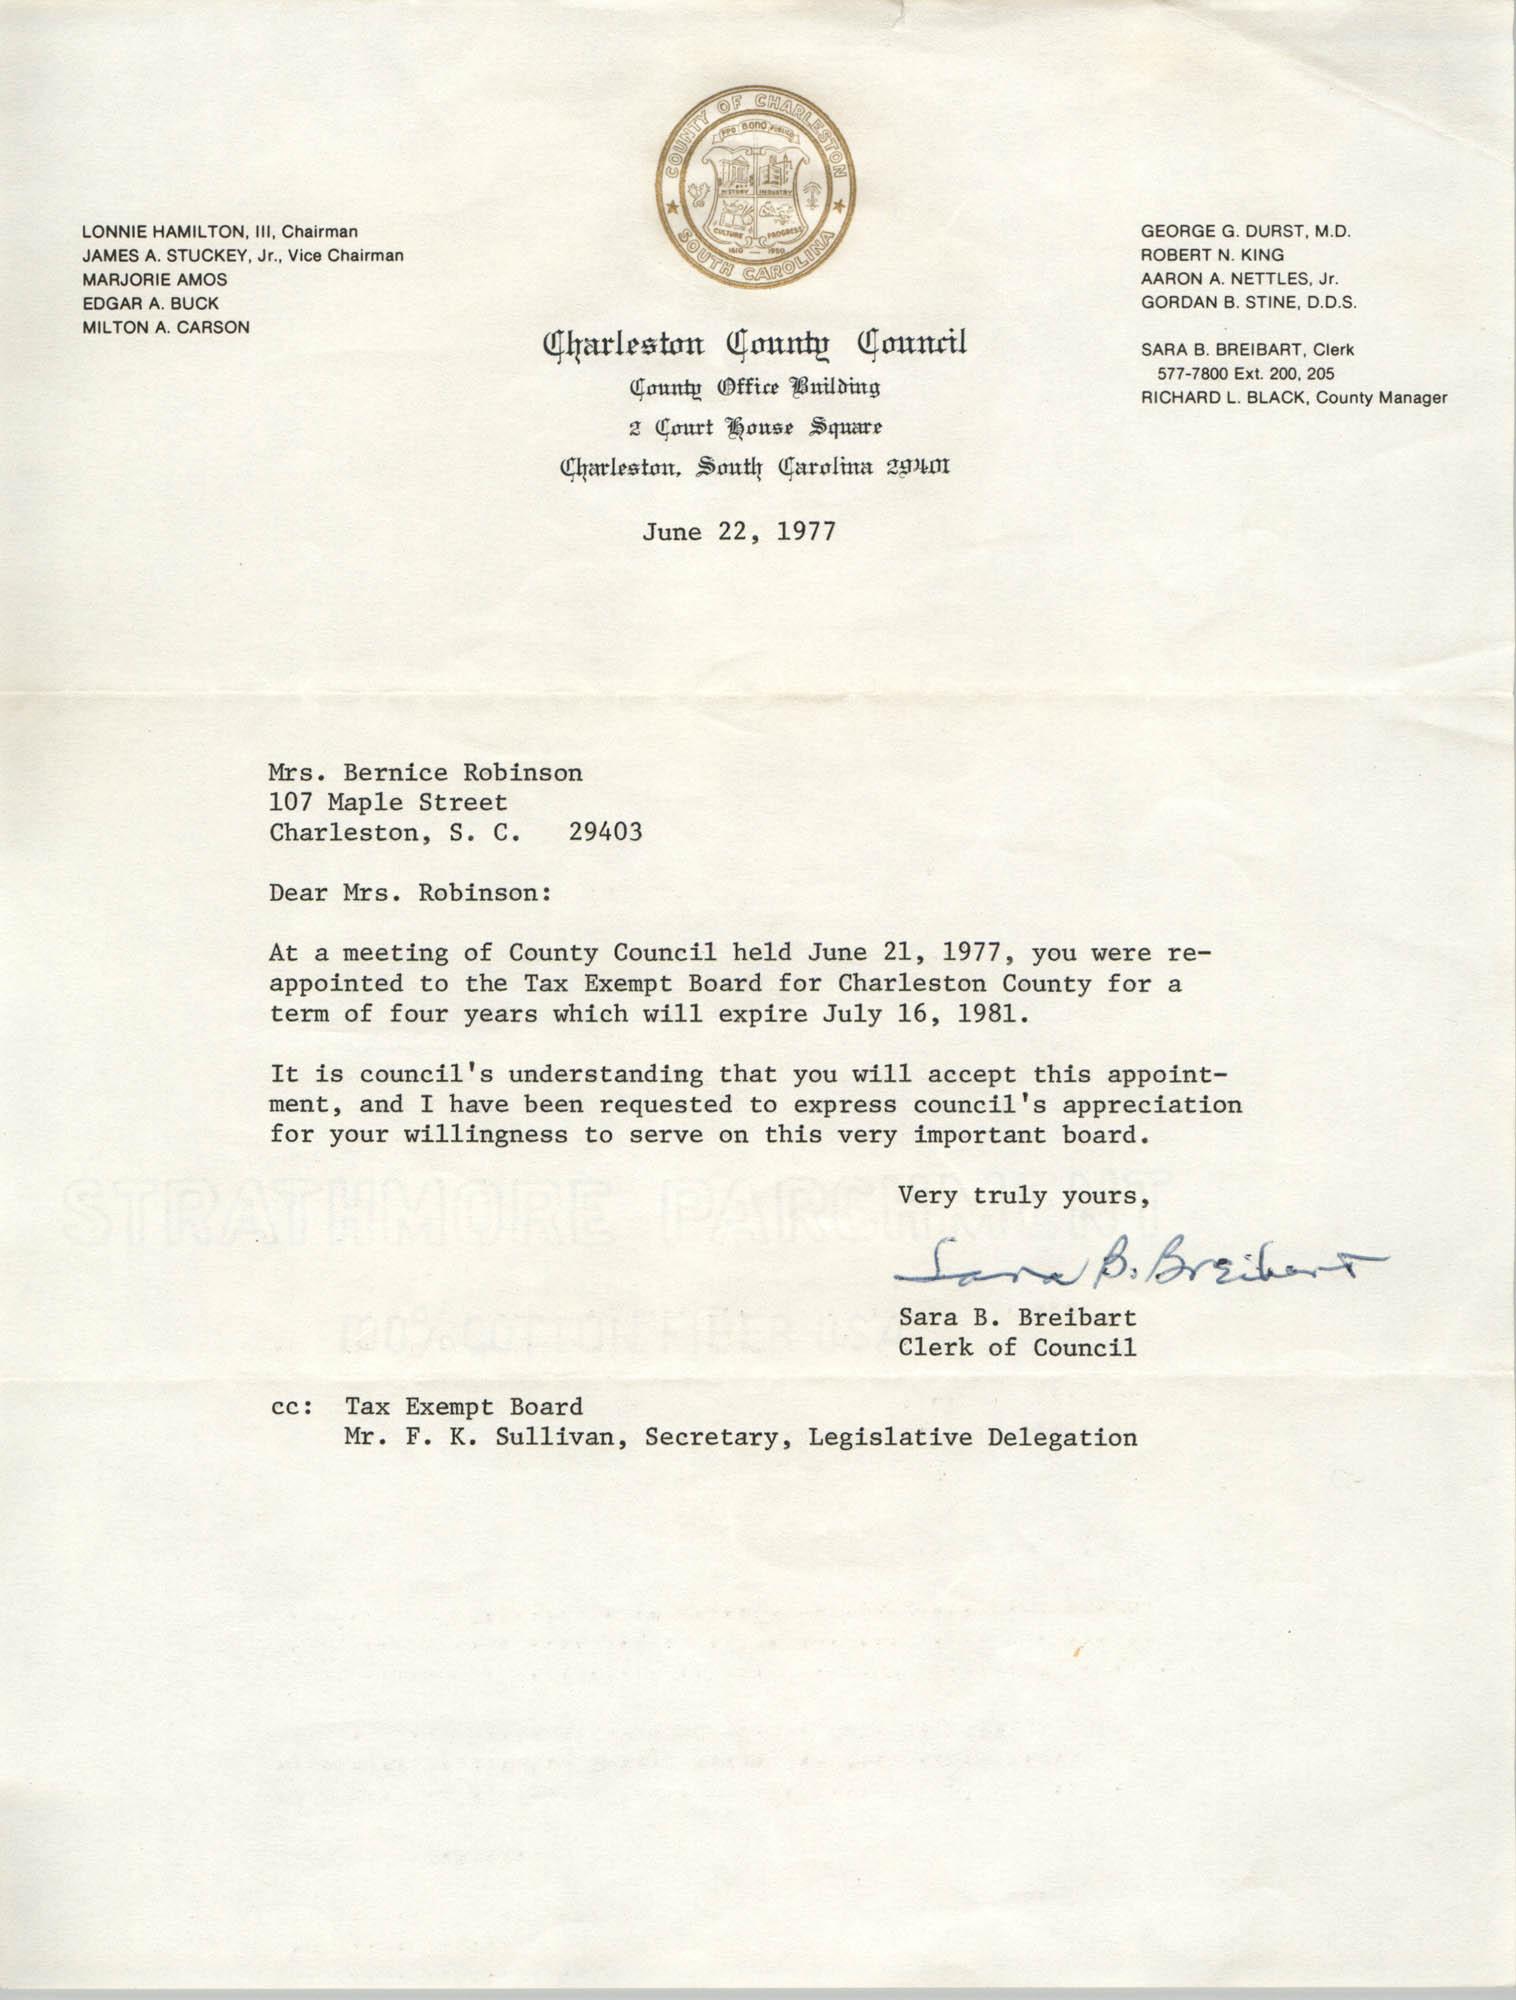 Letter from Sara B. Breibart to Bernice Robinson, June 22, 1977